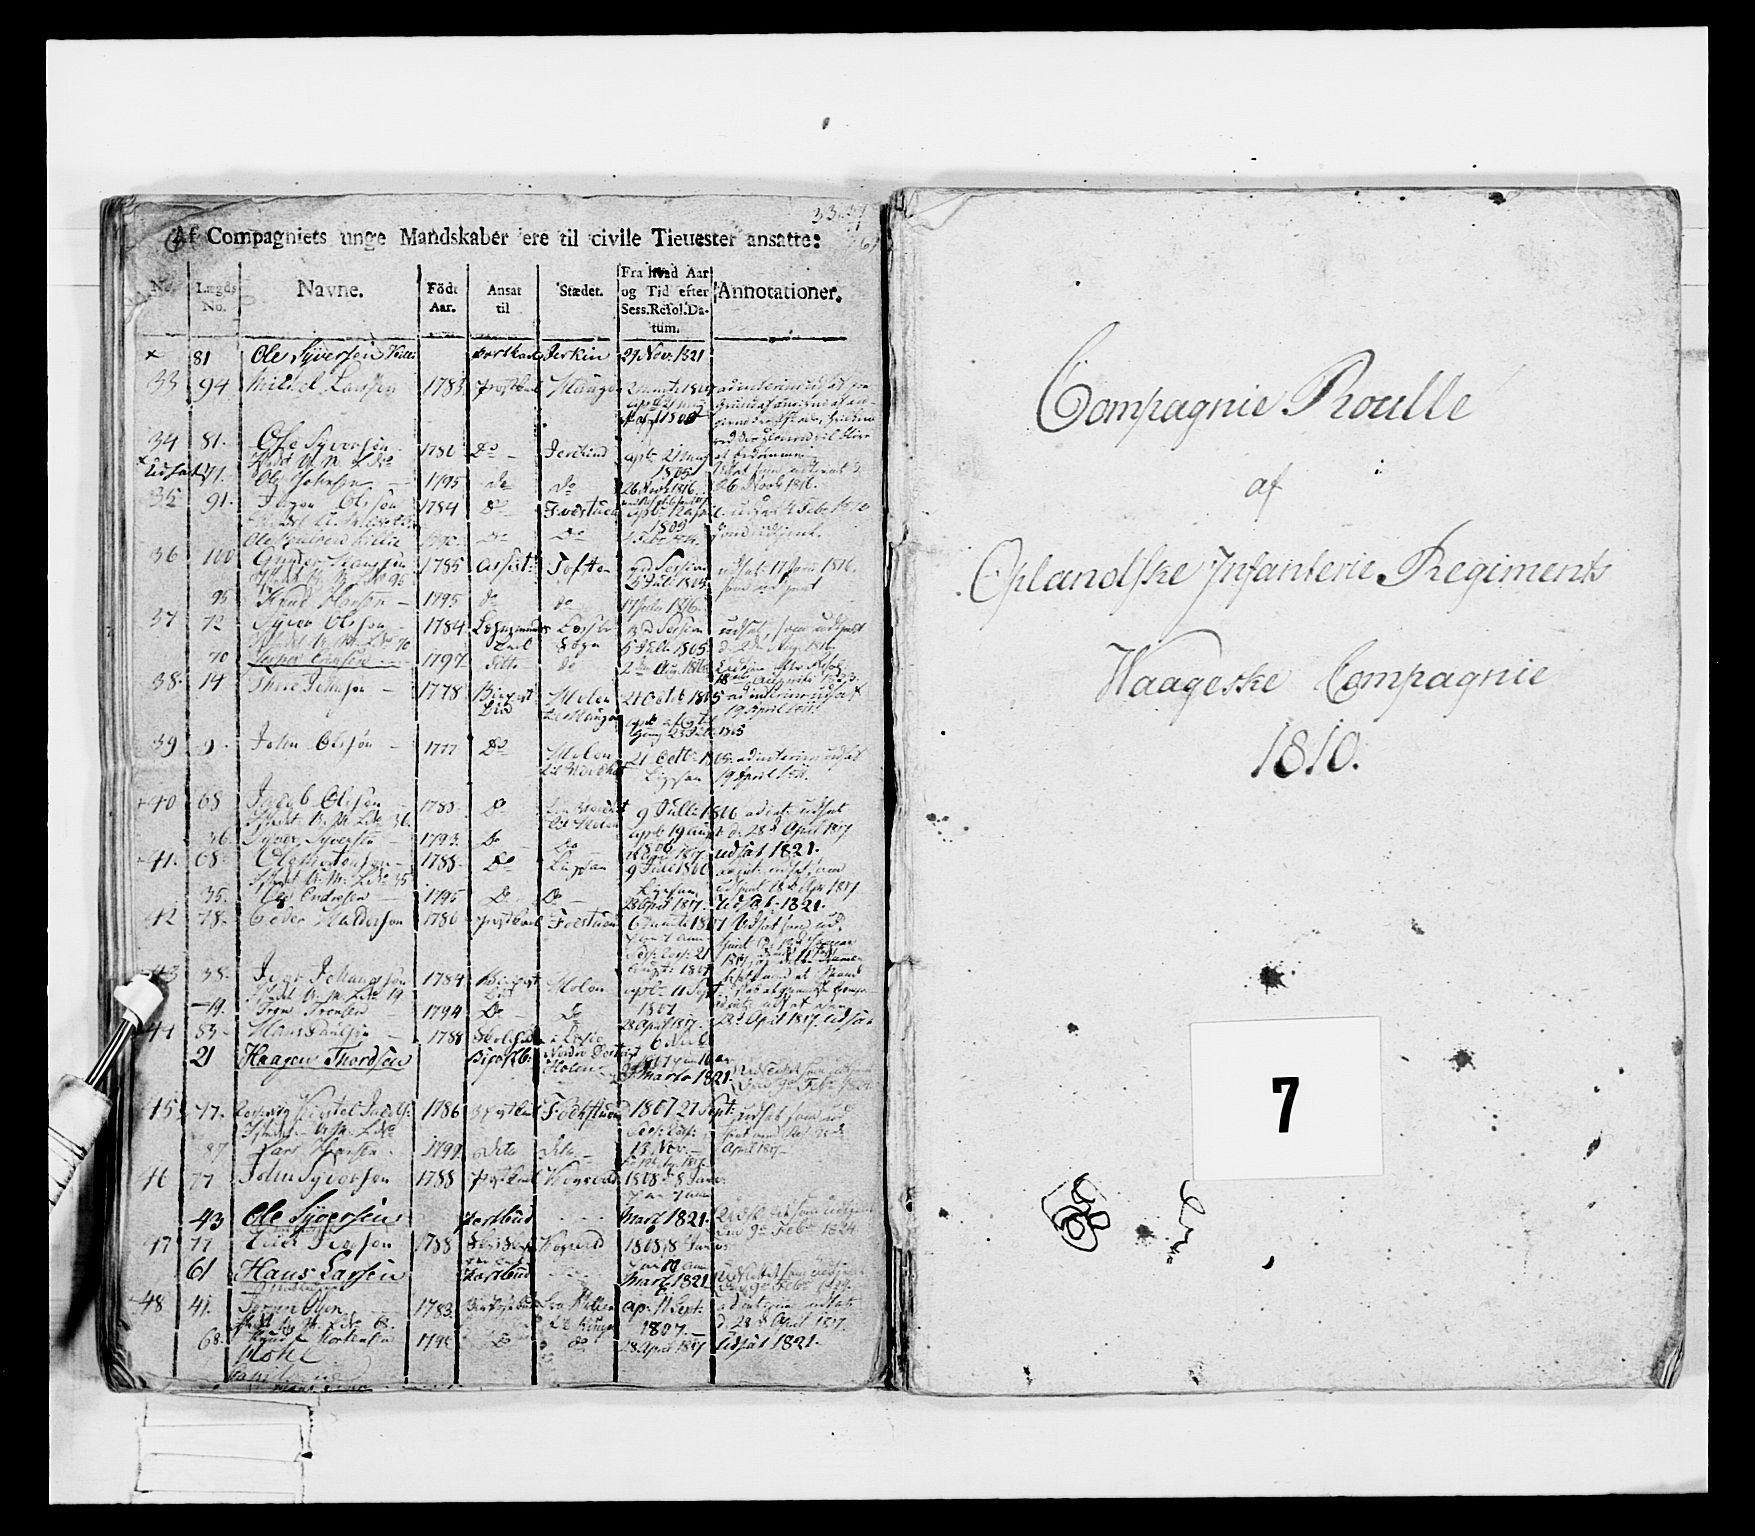 RA, Generalitets- og kommissariatskollegiet, Det kongelige norske kommissariatskollegium, E/Eh/L0069: Opplandske gevorbne infanteriregiment, 1810-1818, s. 316